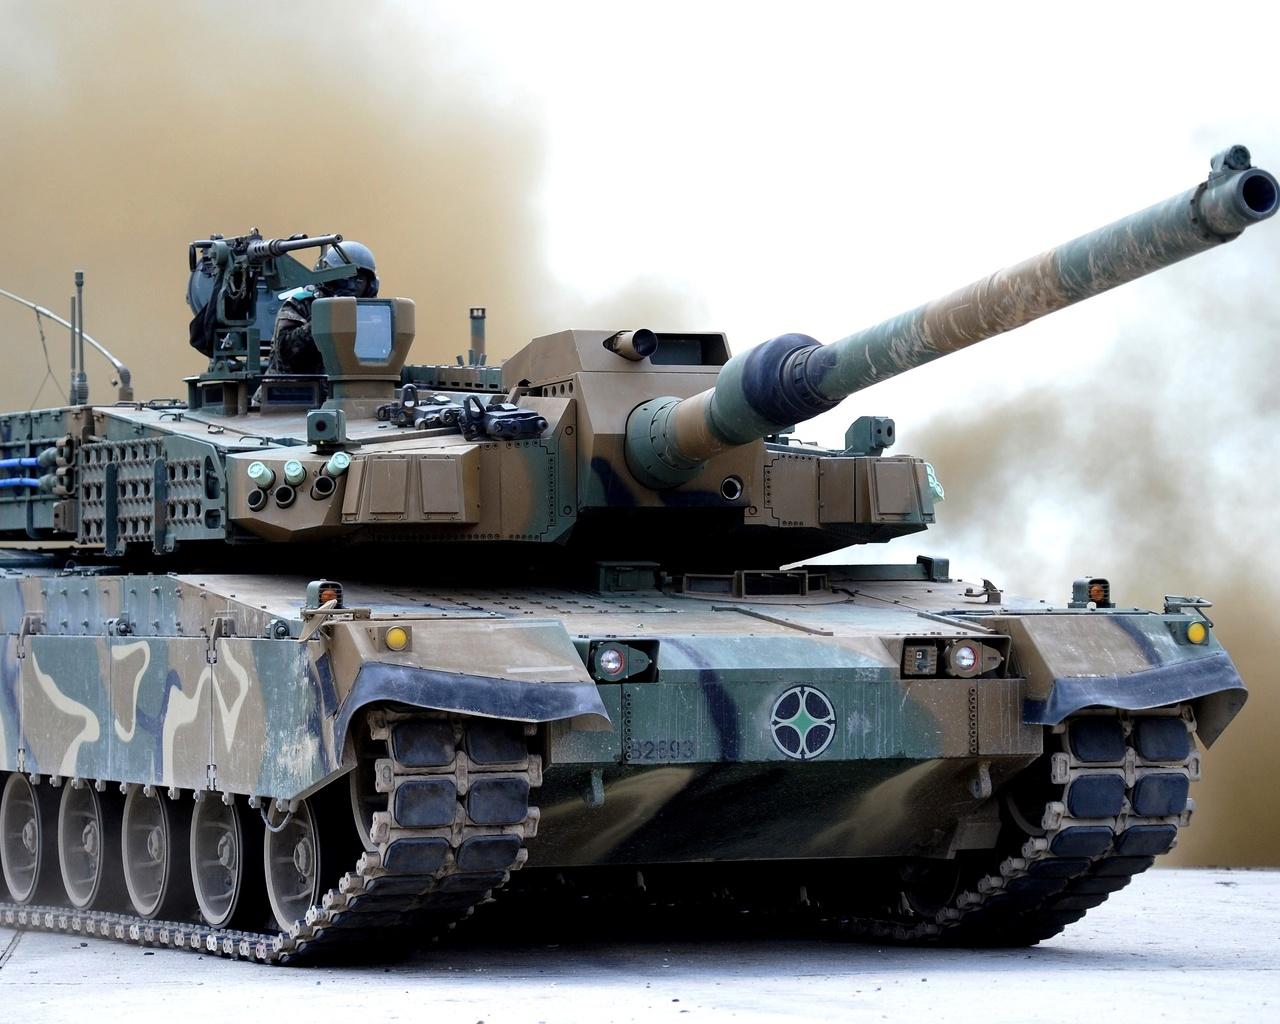 k2 black panther, южная корея, танк, броня